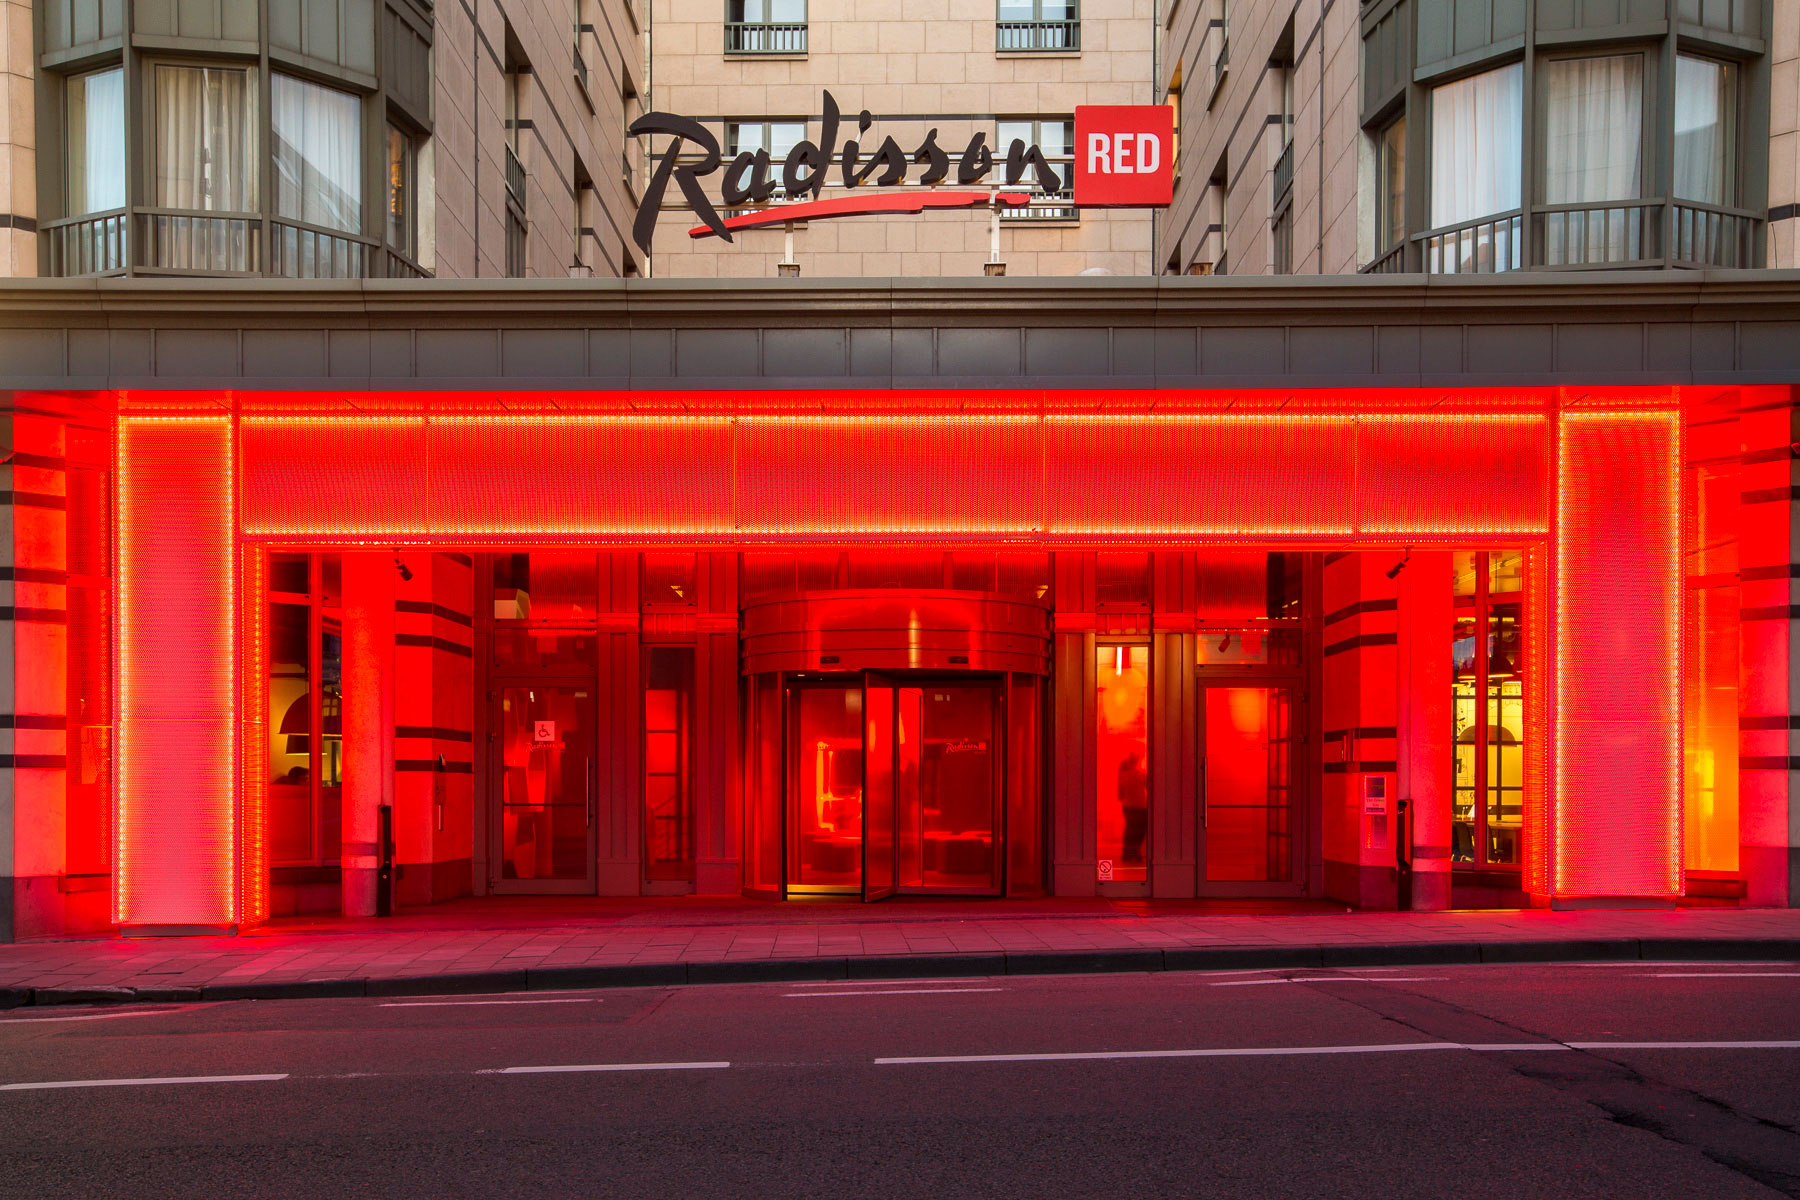 Radisson RED Brussels